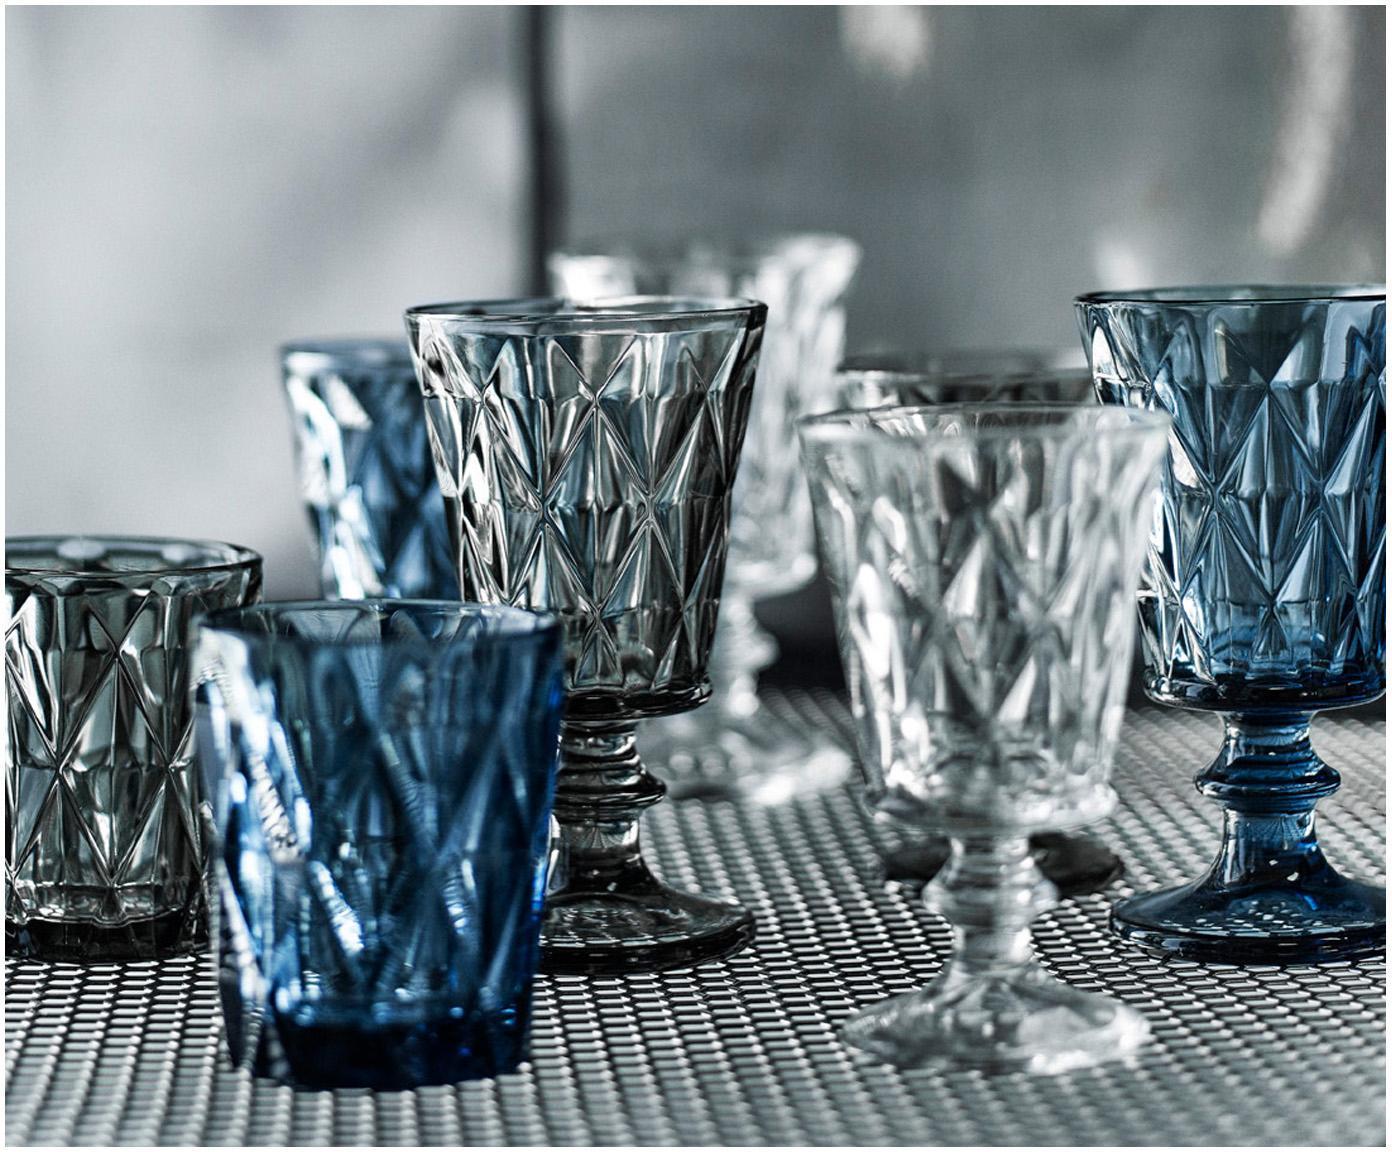 Bicchiere da vino Diamond 6 pz, Vetro, Grigio scuro, leggermente trasparente, Ø 9 x Alt. 16 cm